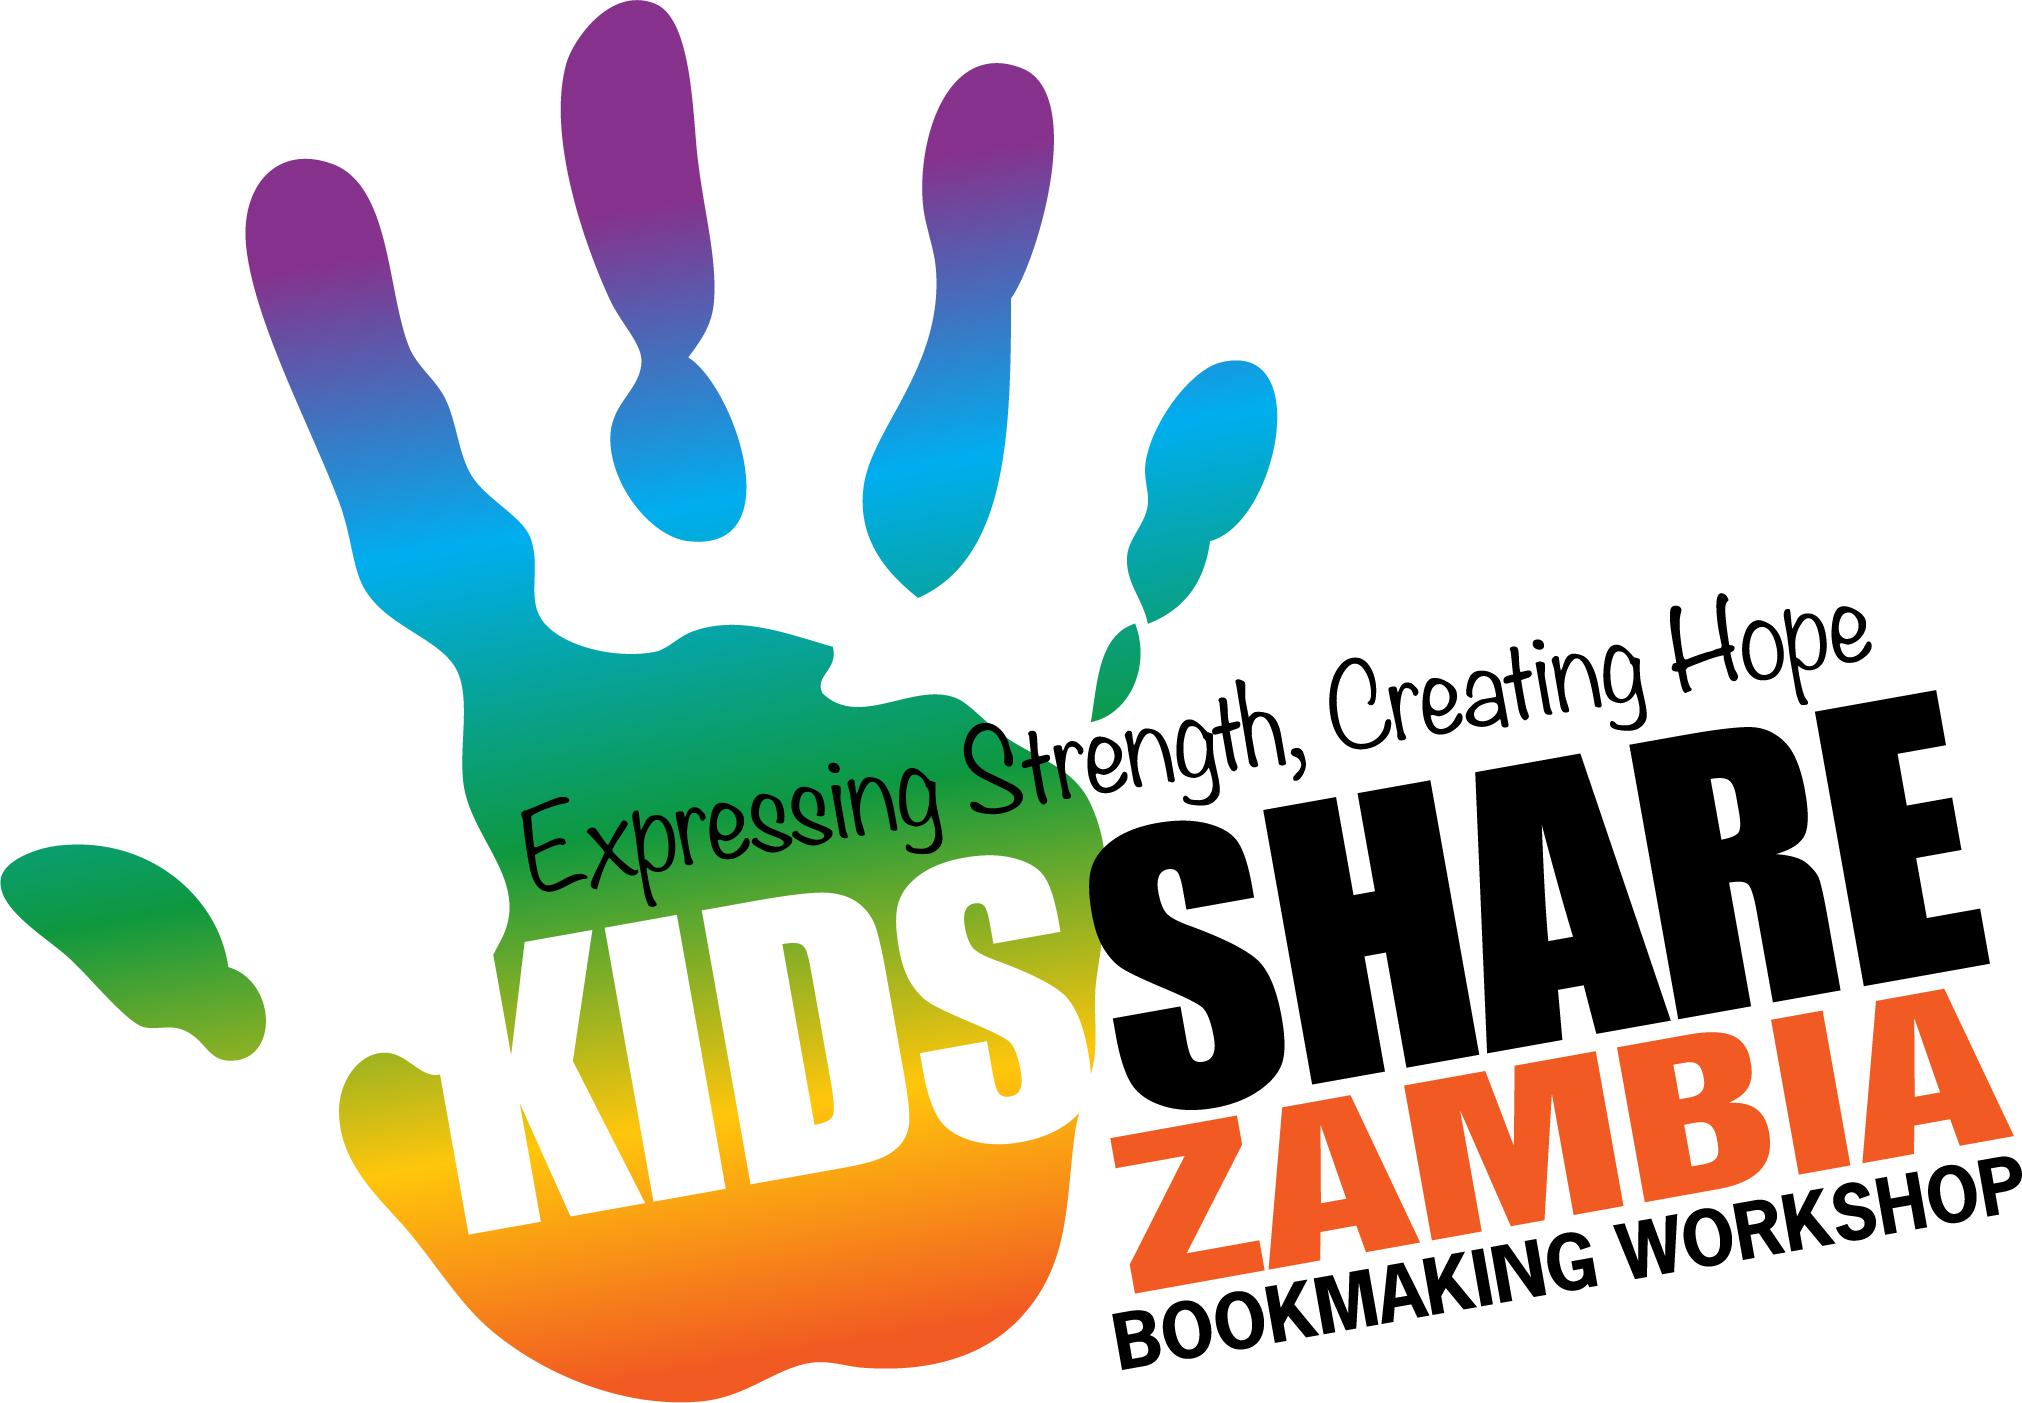 KSW_Zambia logo.jpg